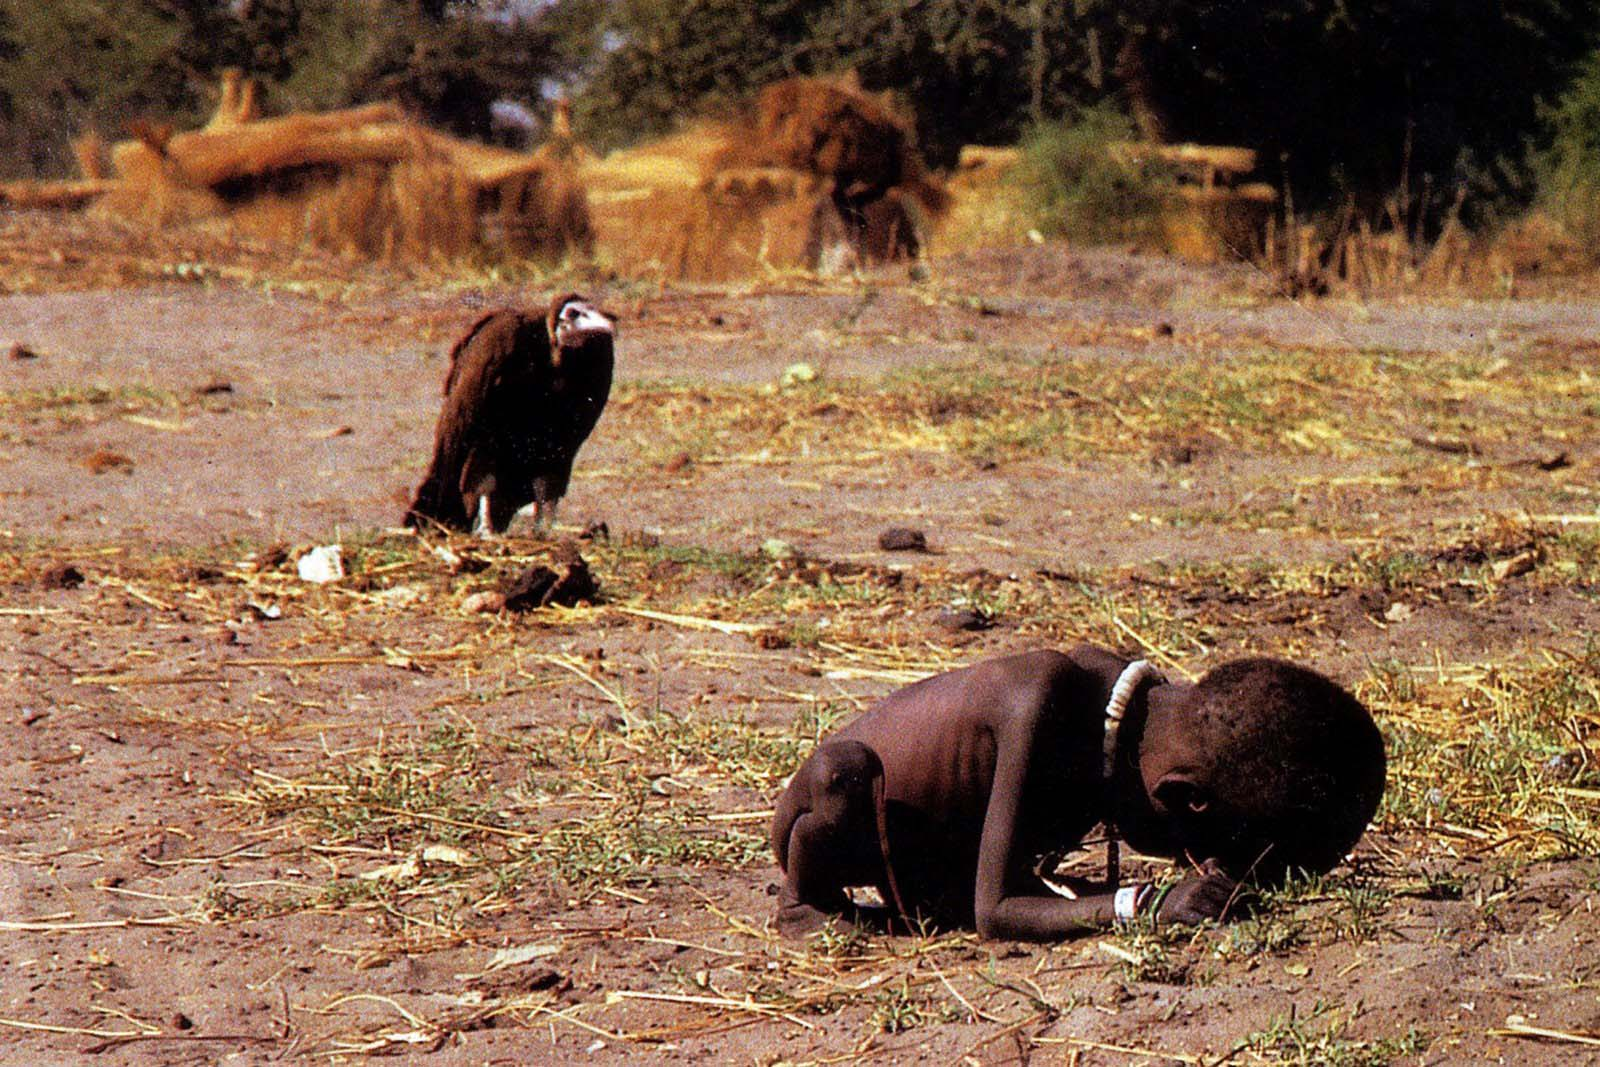 vultureandlittlegirl image